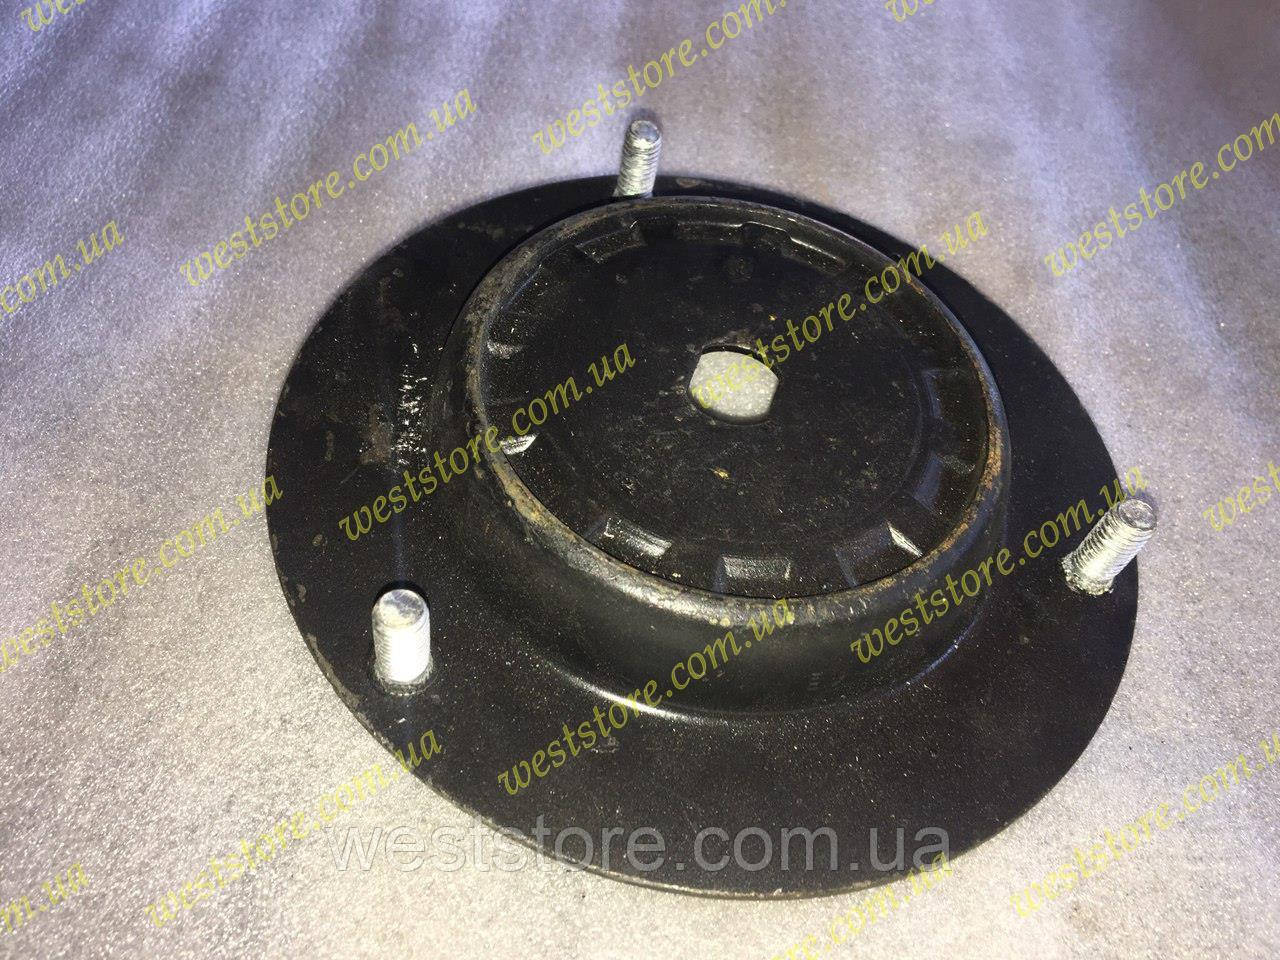 Опора переднего амортизатора (стойки) москвич 2141 Полиэдр усиленная